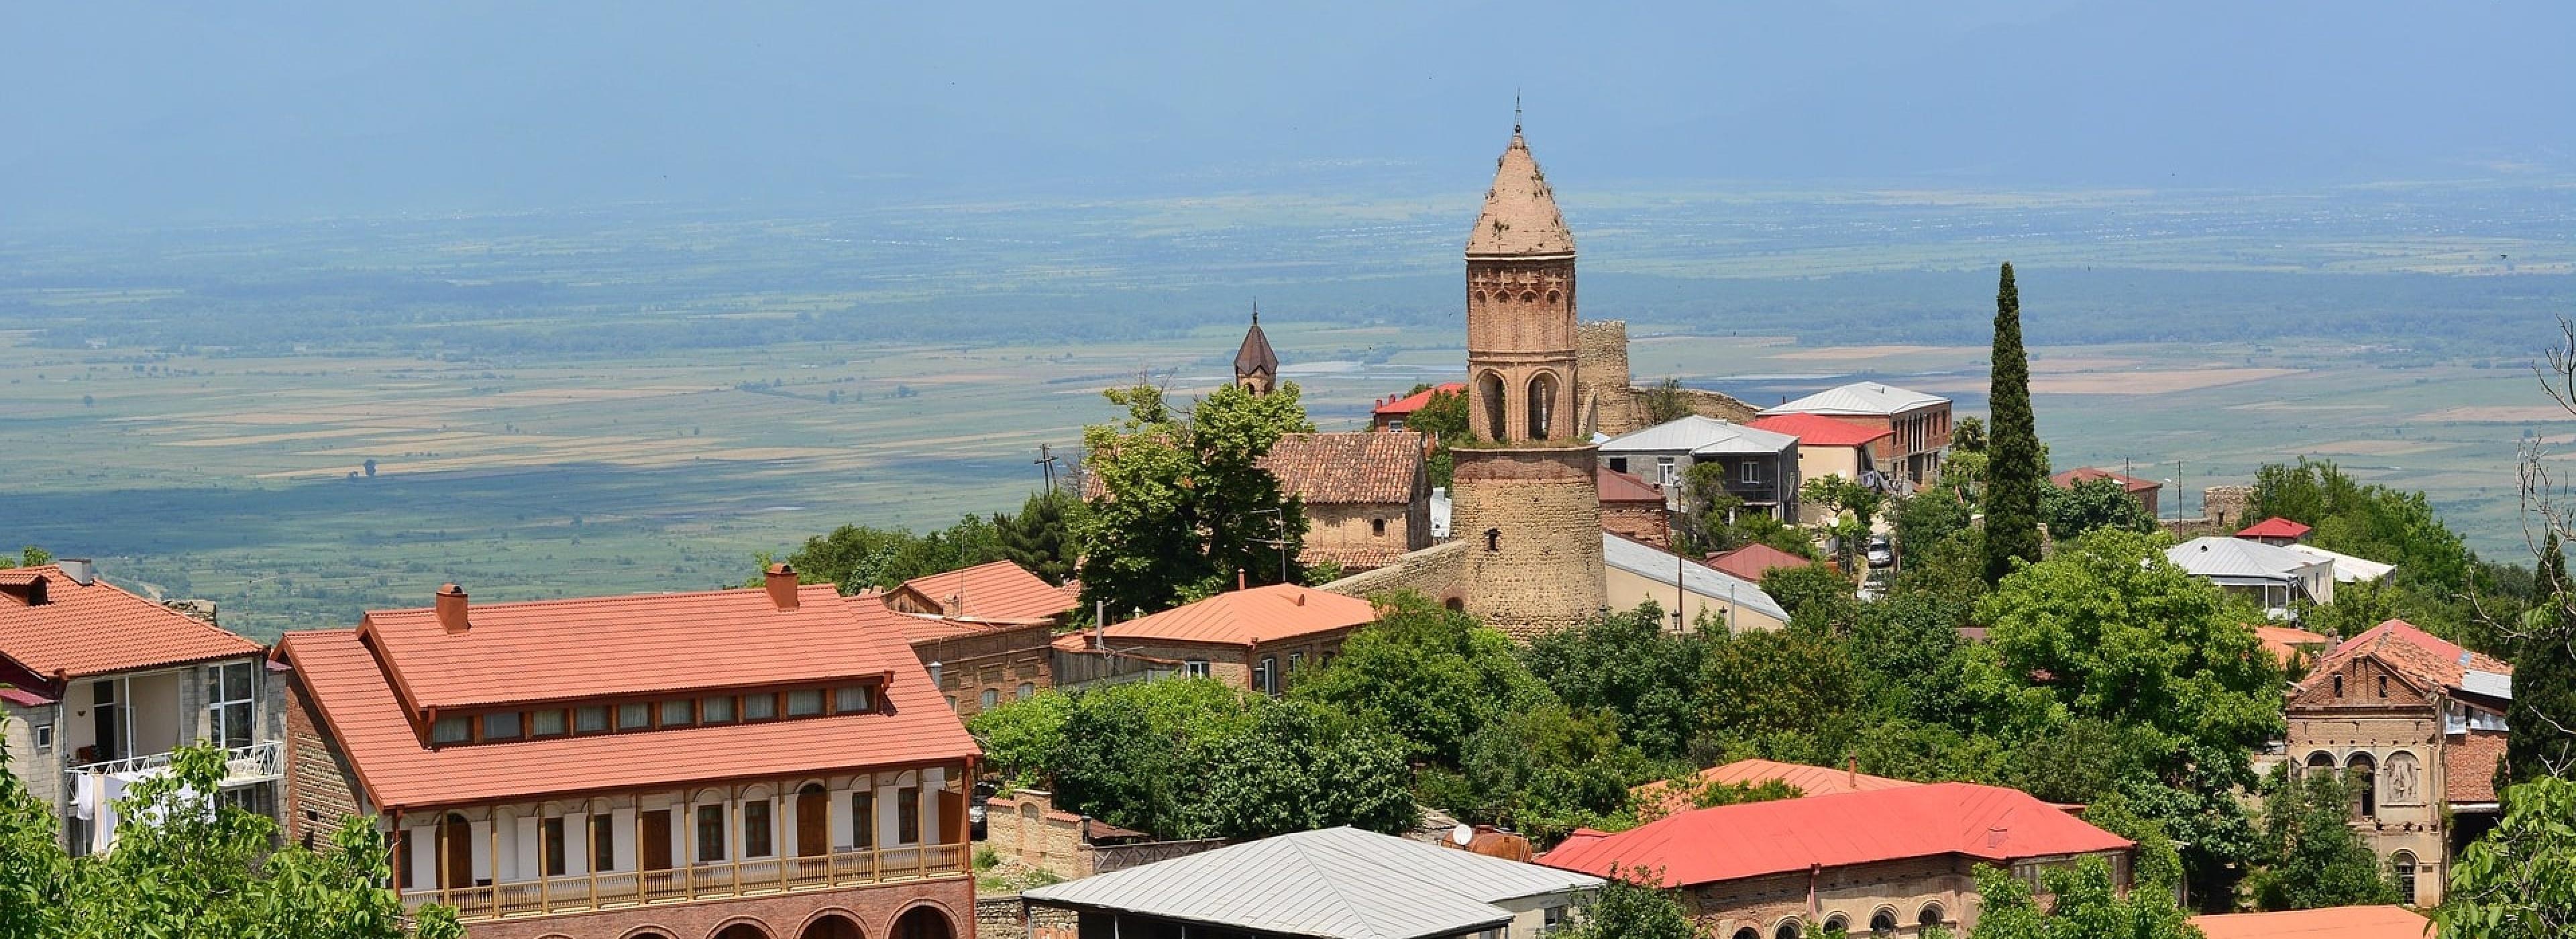 Kakheti